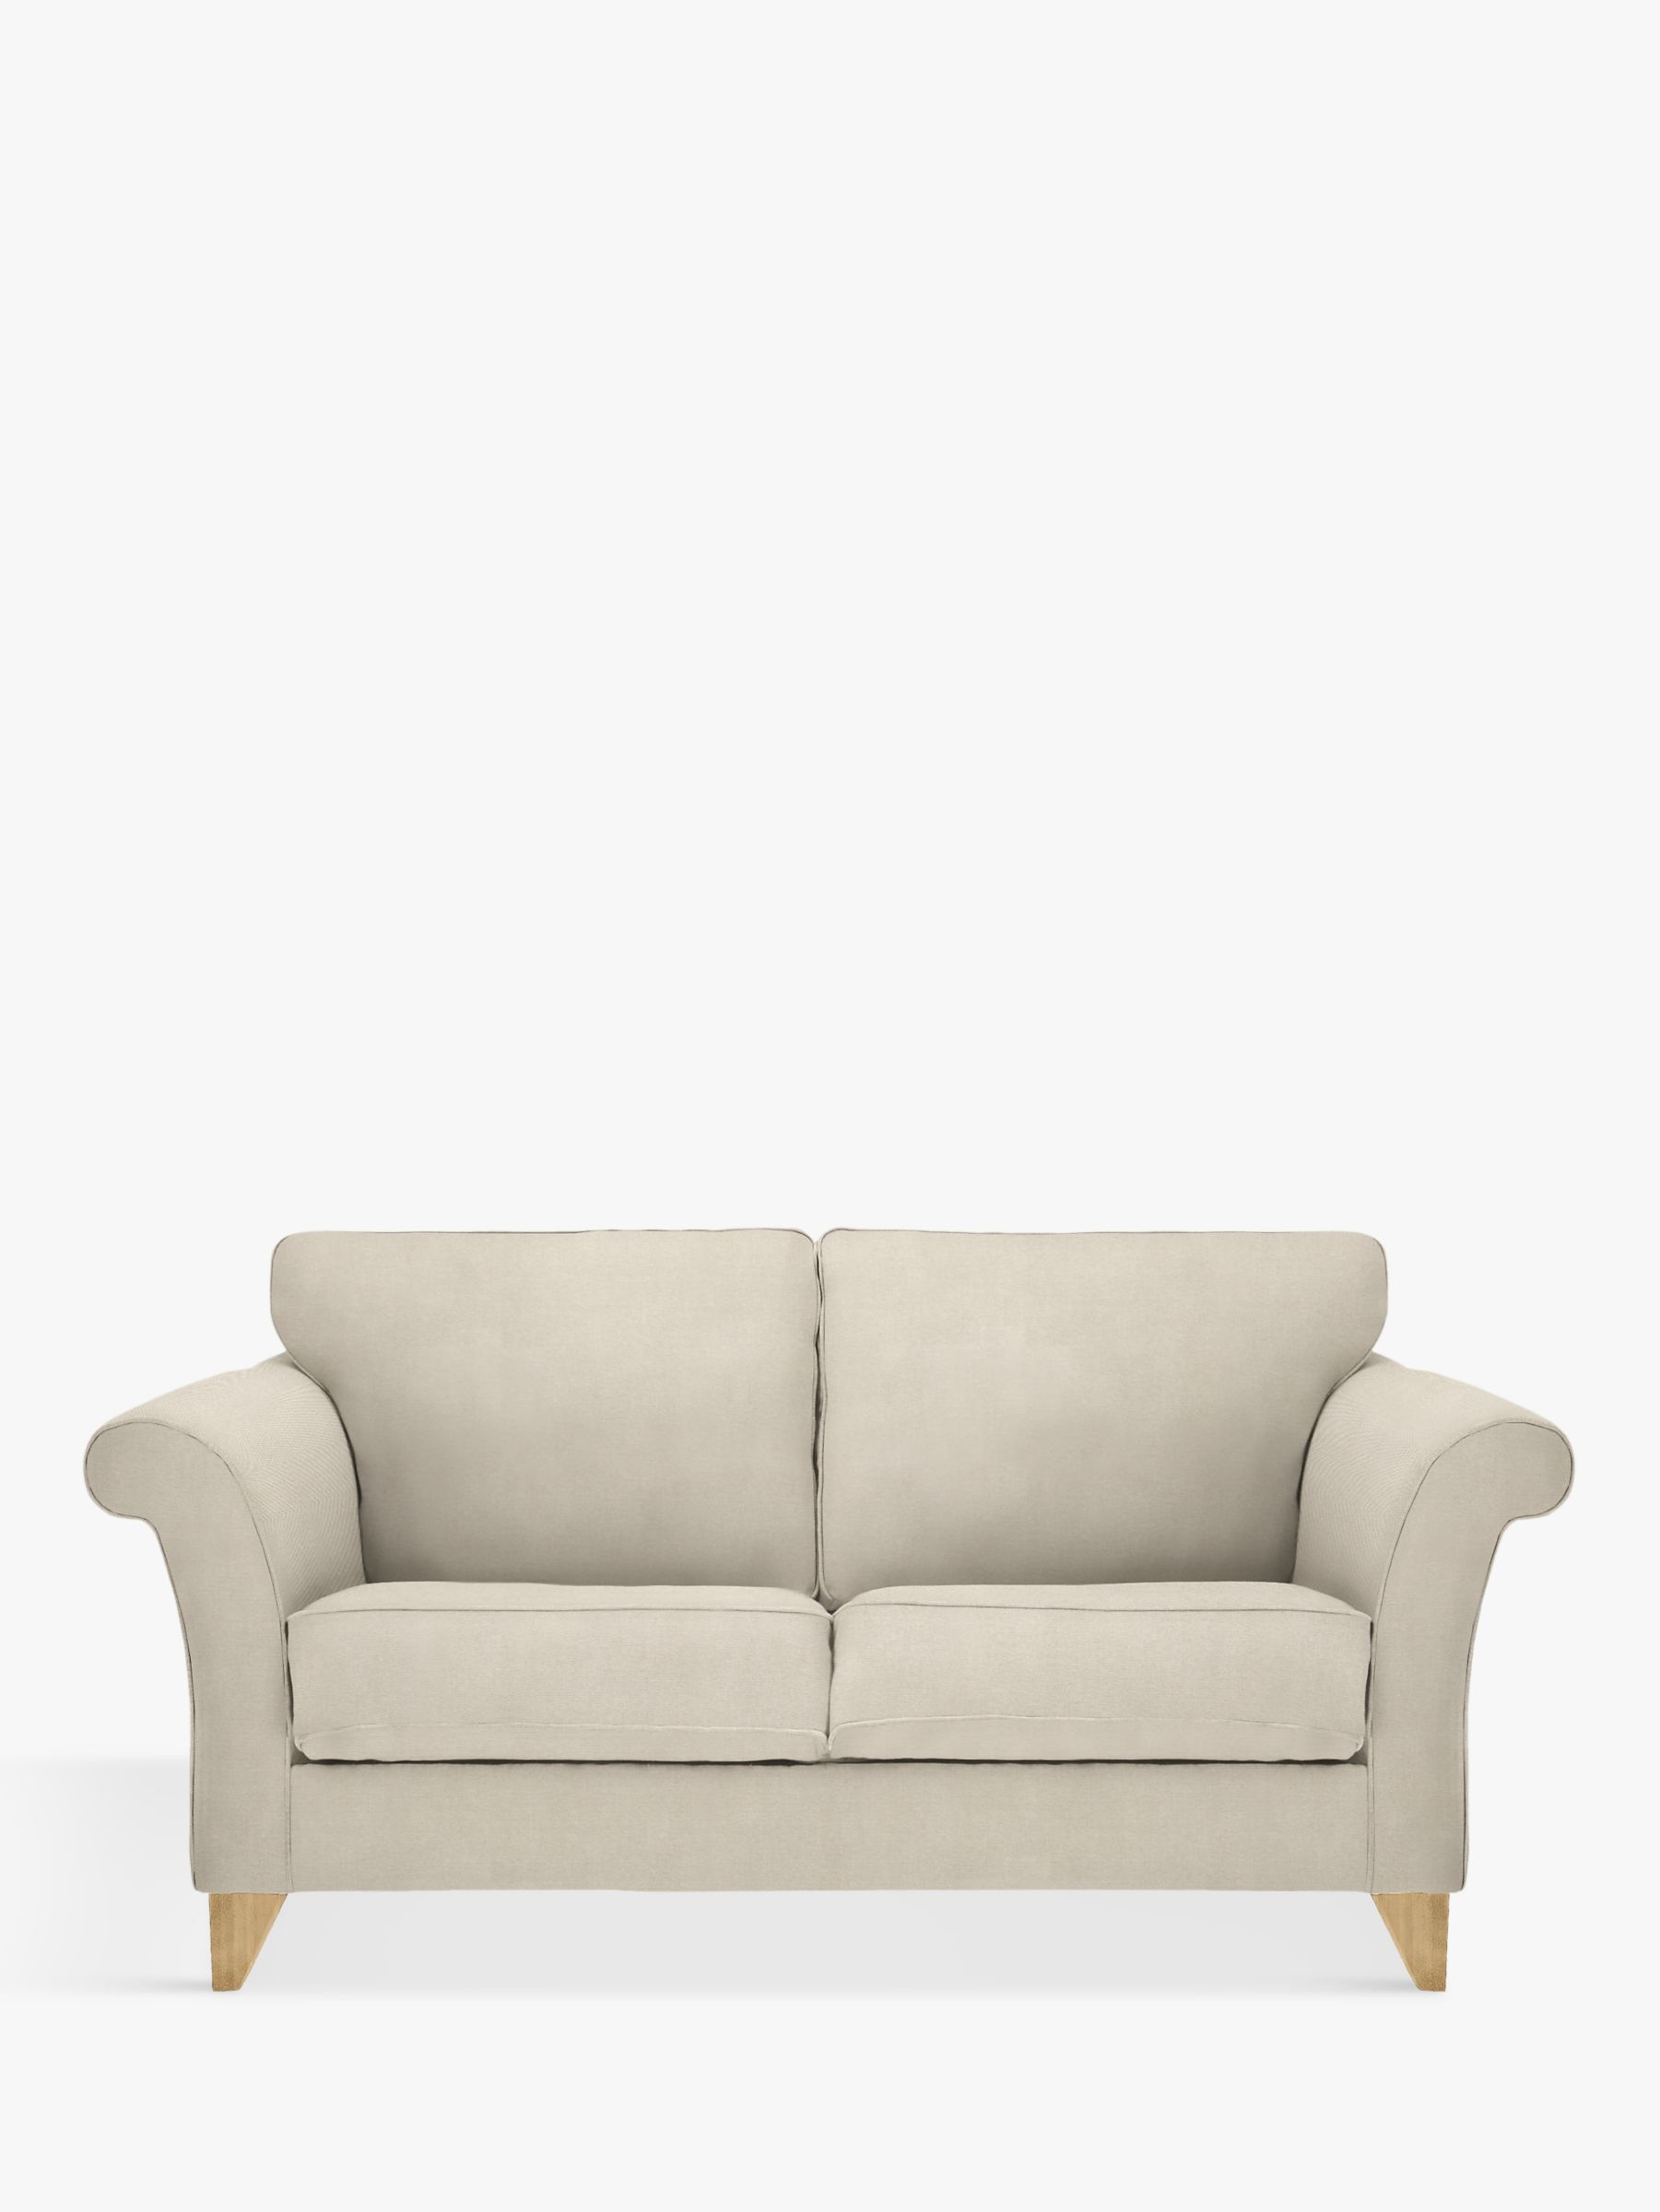 pink sofa browse uk bed ebay singapore 2 seater sofas beds john lewis partners charlotte medium light leg edie grey